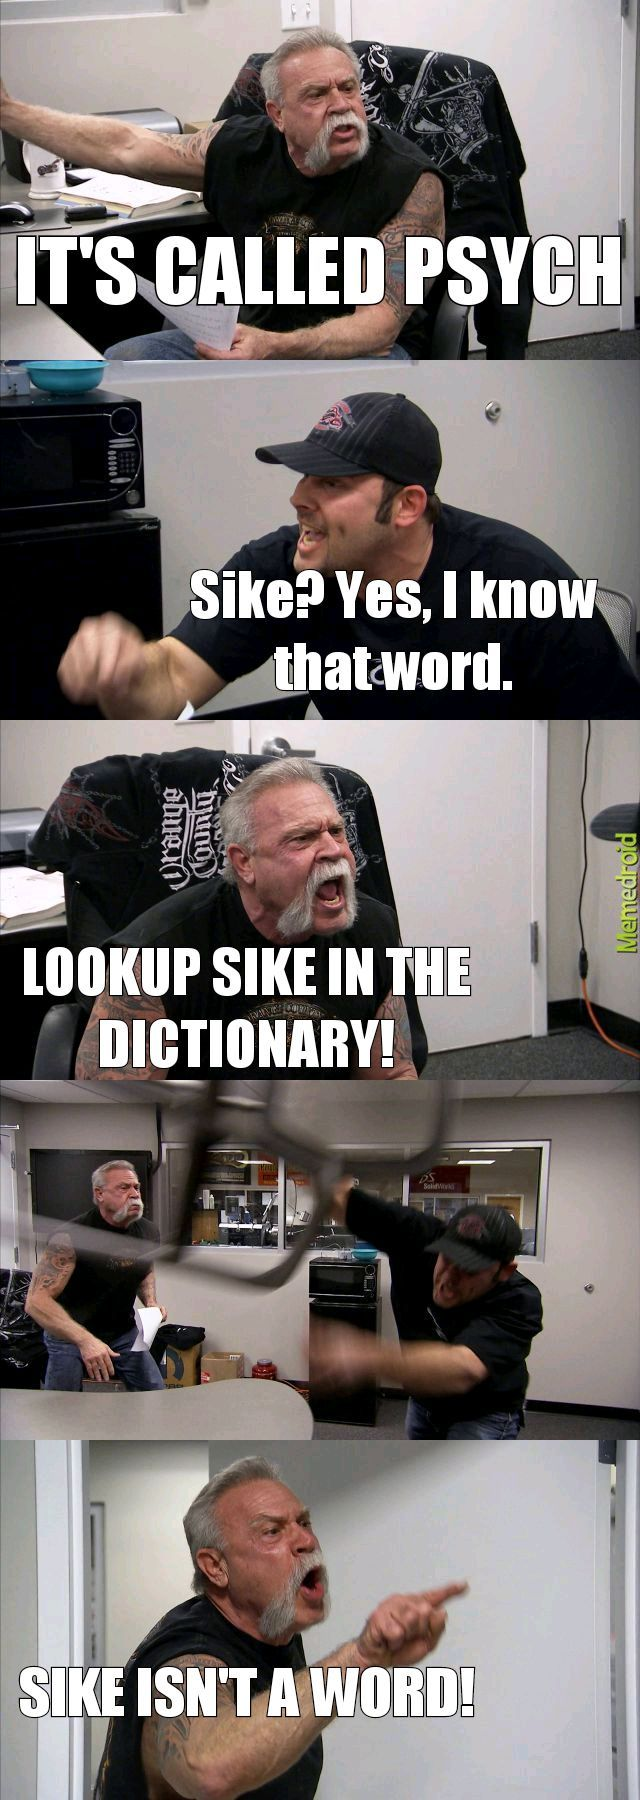 PSYCH, not SIKE - meme